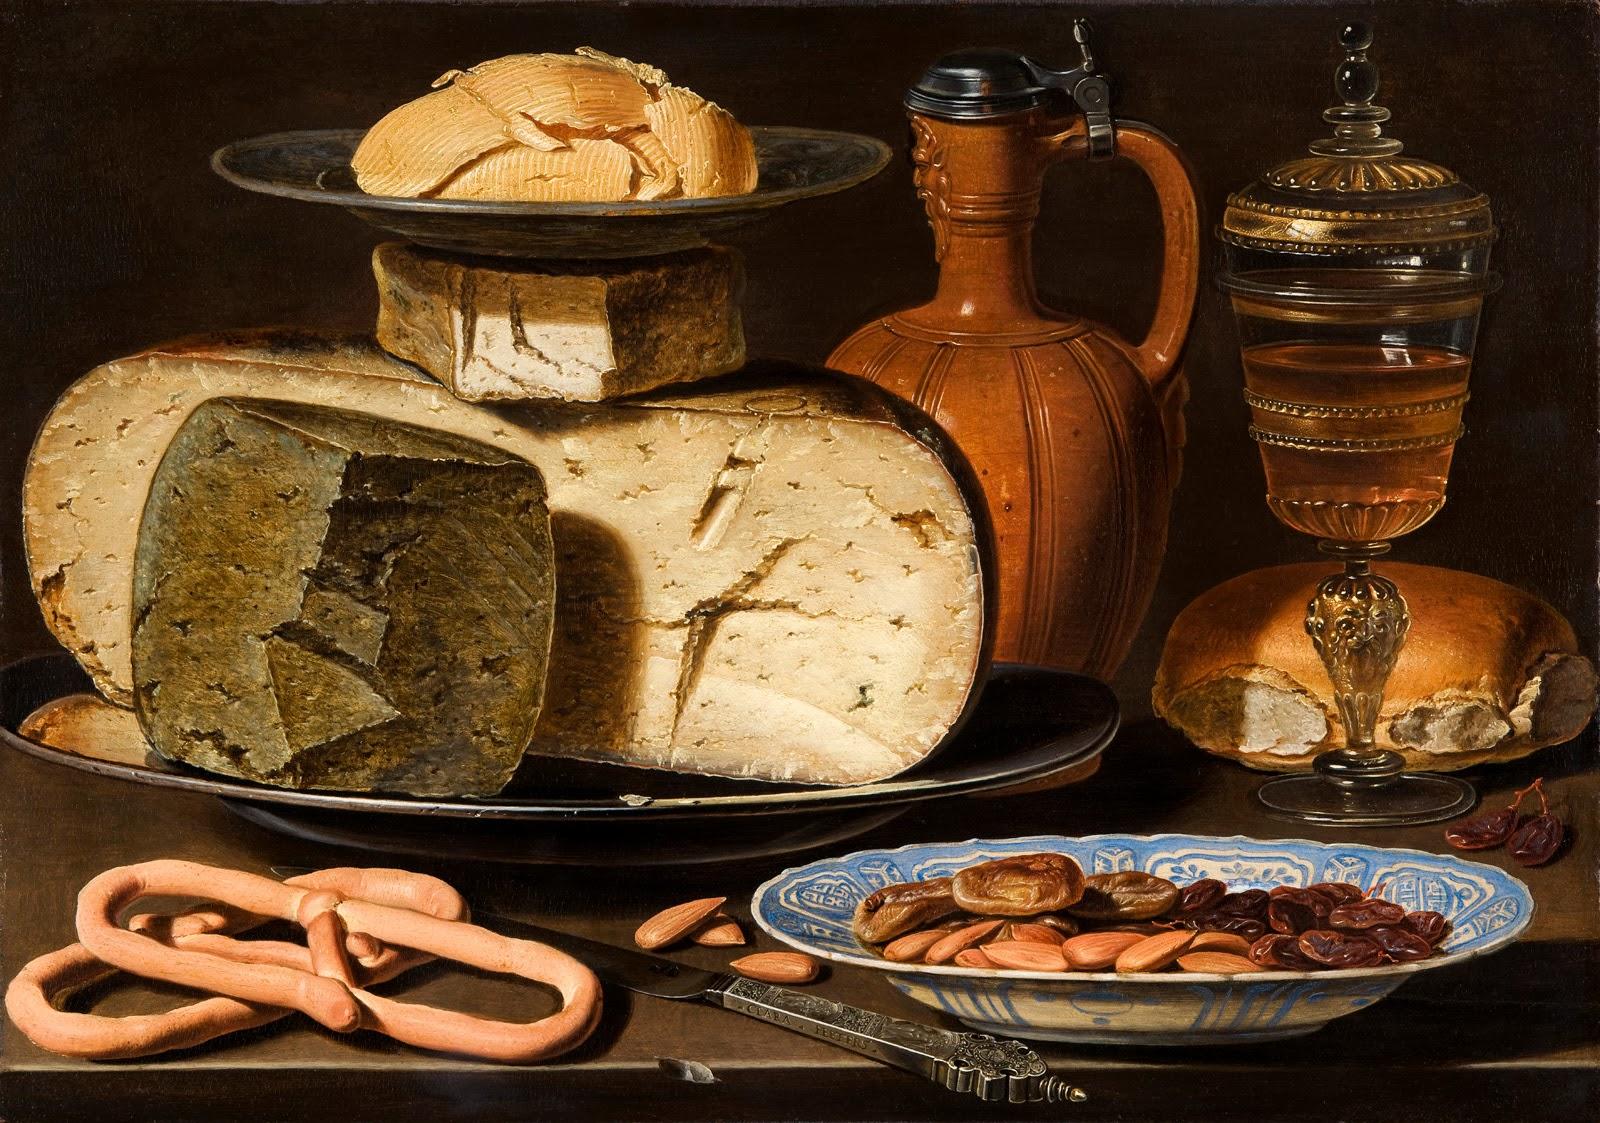 artbouillon: Flemish Food Art: An Appreciation